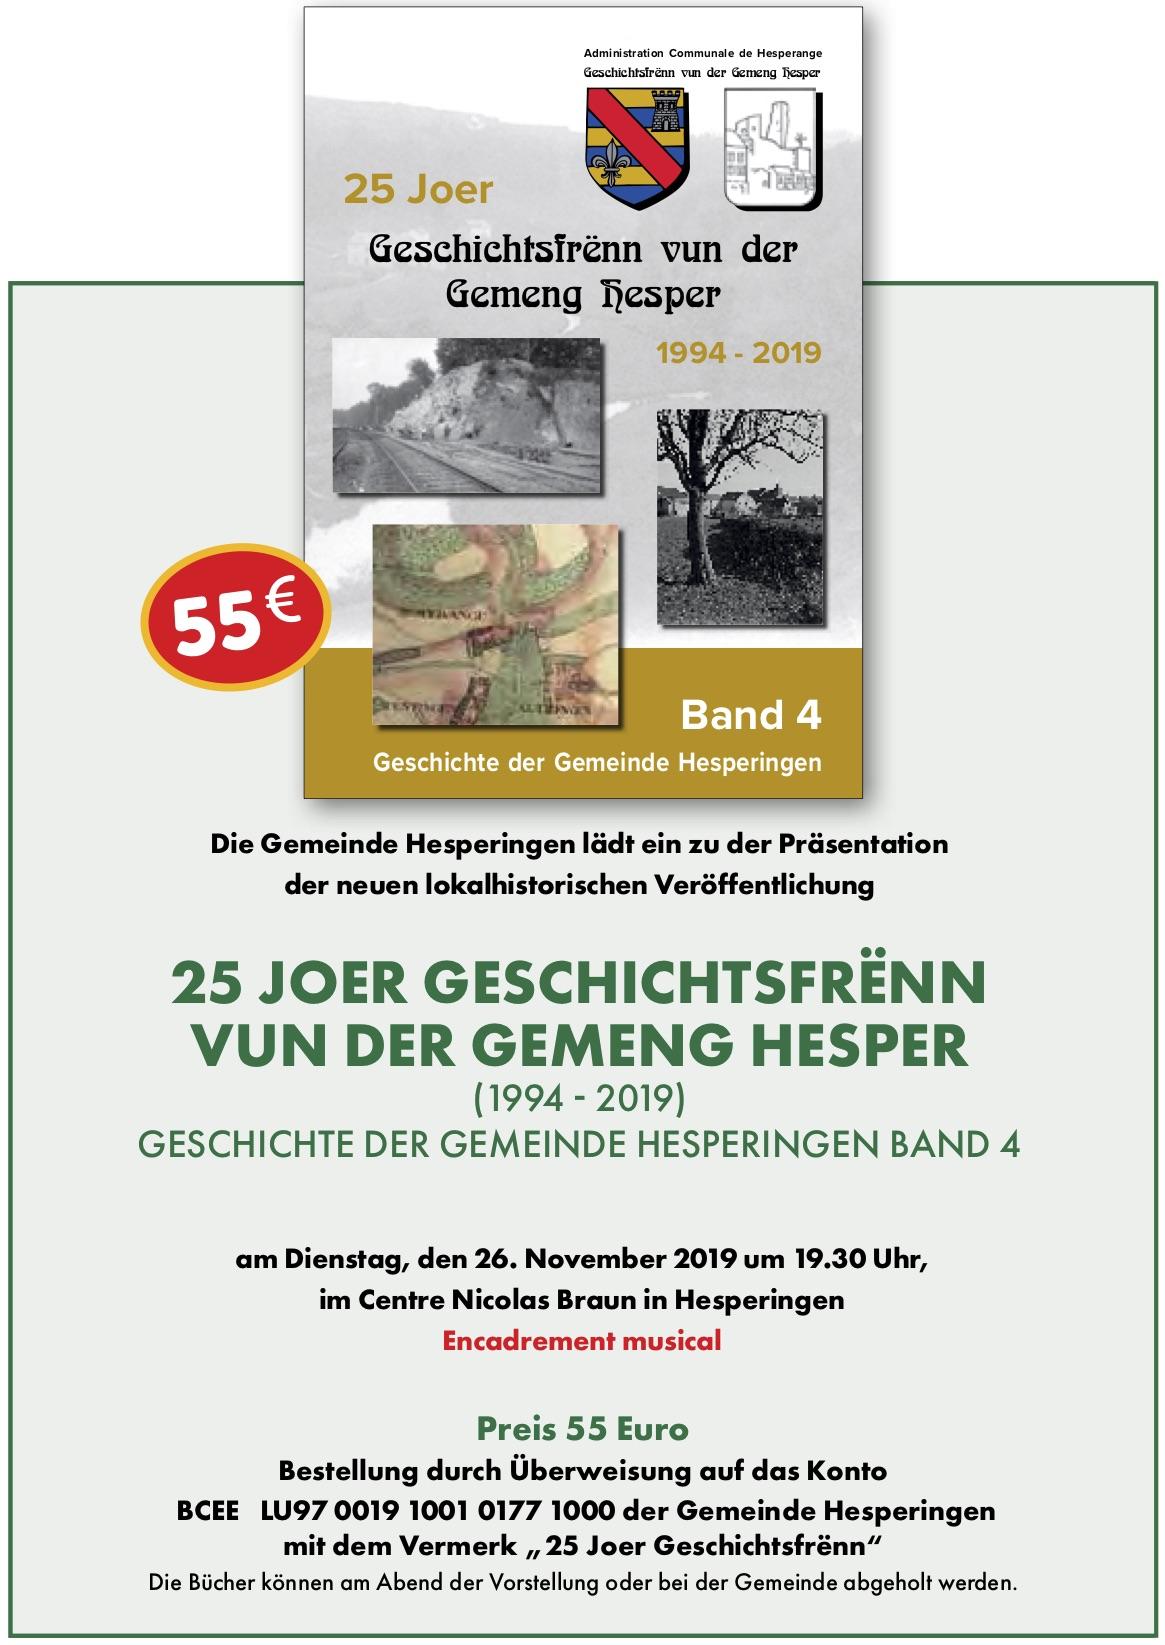 Neue lokalhistorische Veröffentlichung : 25 Joer Geschichtsfrënn vun der Gemeng Hesper - Geschichte der Gemeinde Hesperingen Band 4